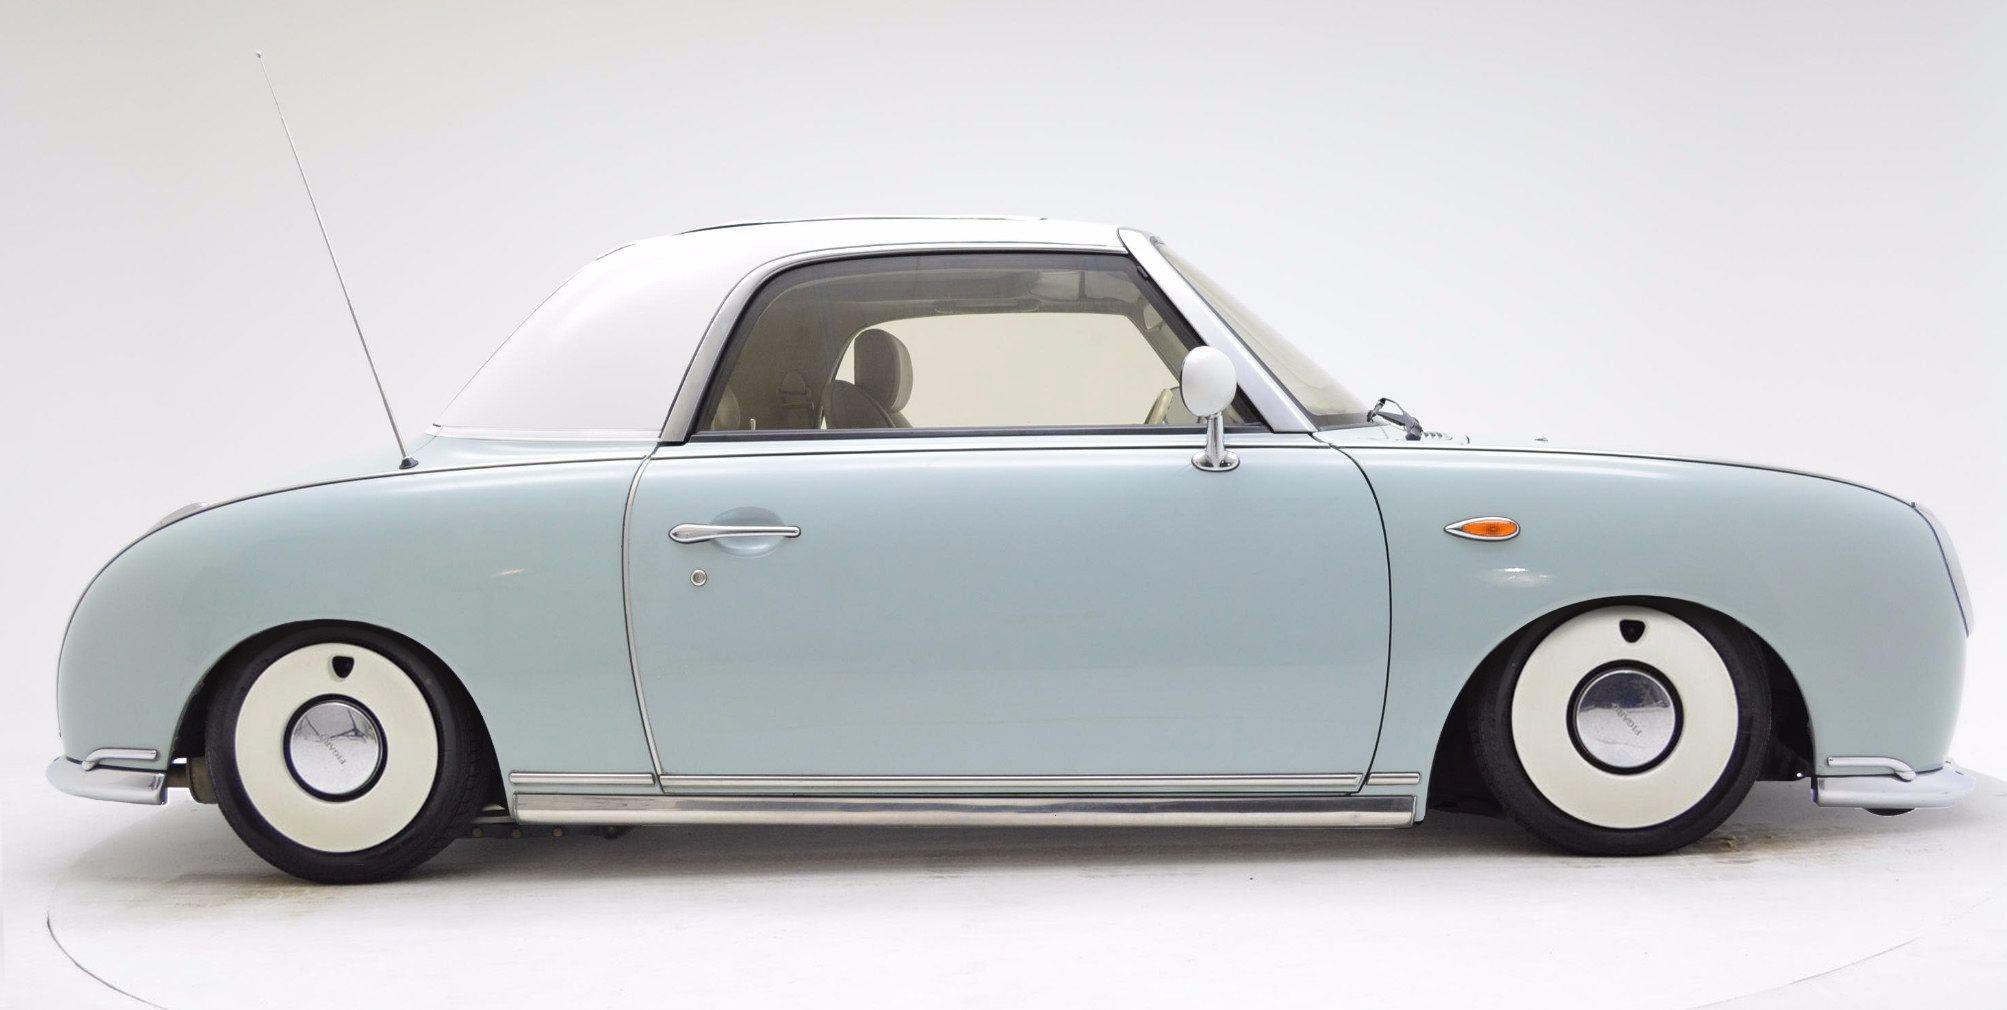 1991 Nissan Figaro 名車 日産